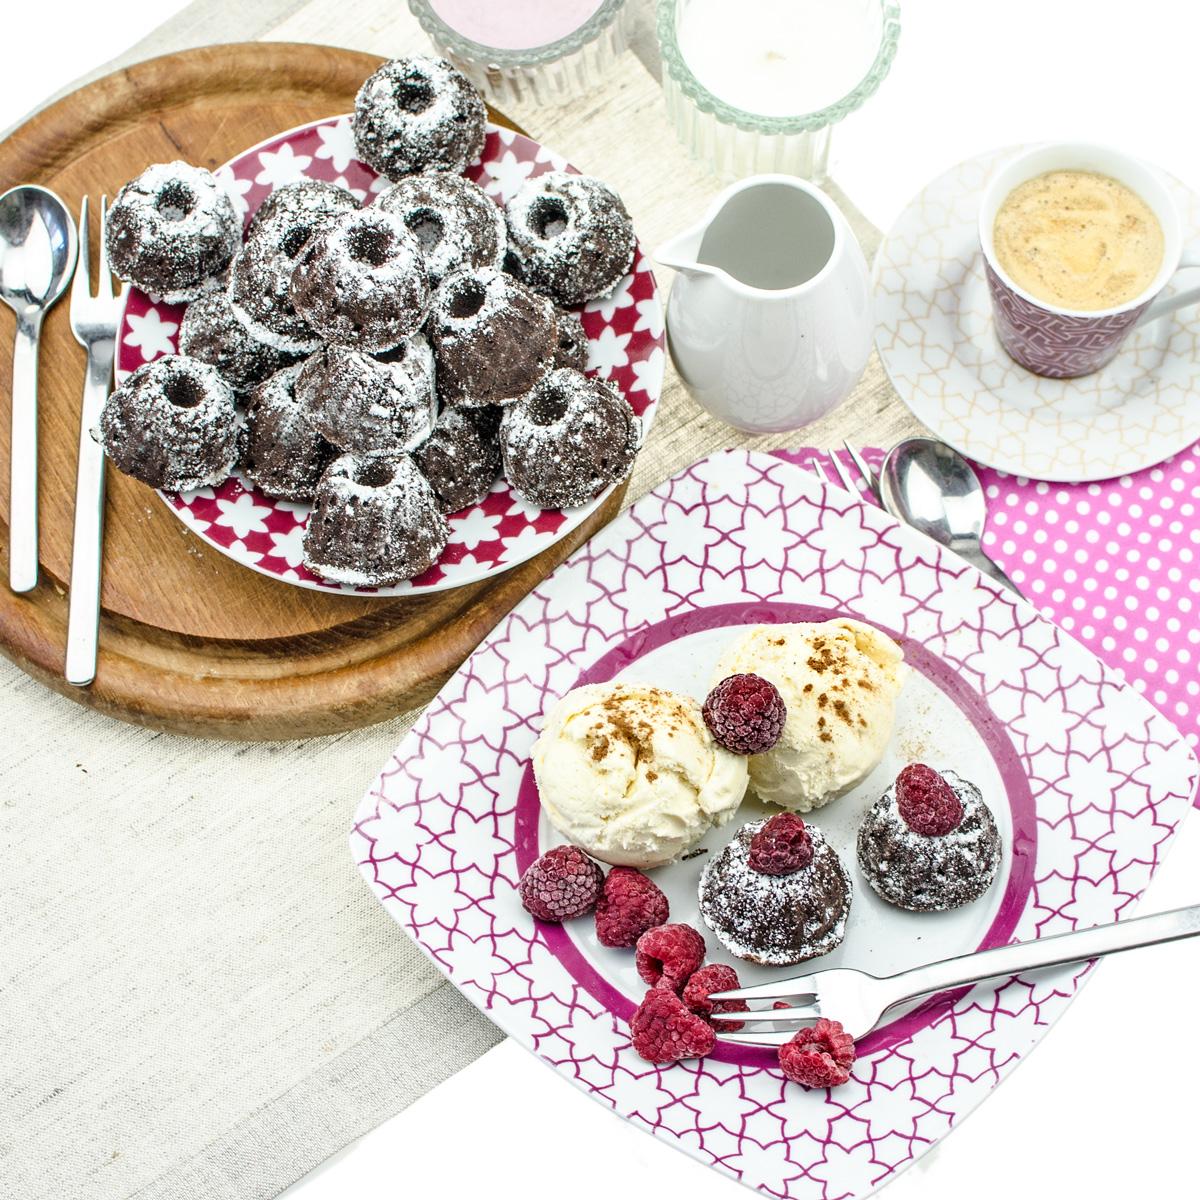 Mini Gugelhupf Cinnamon Brownies | Yummy Gugelhupf Brownies mit Zimt für Schokoladen-Fans